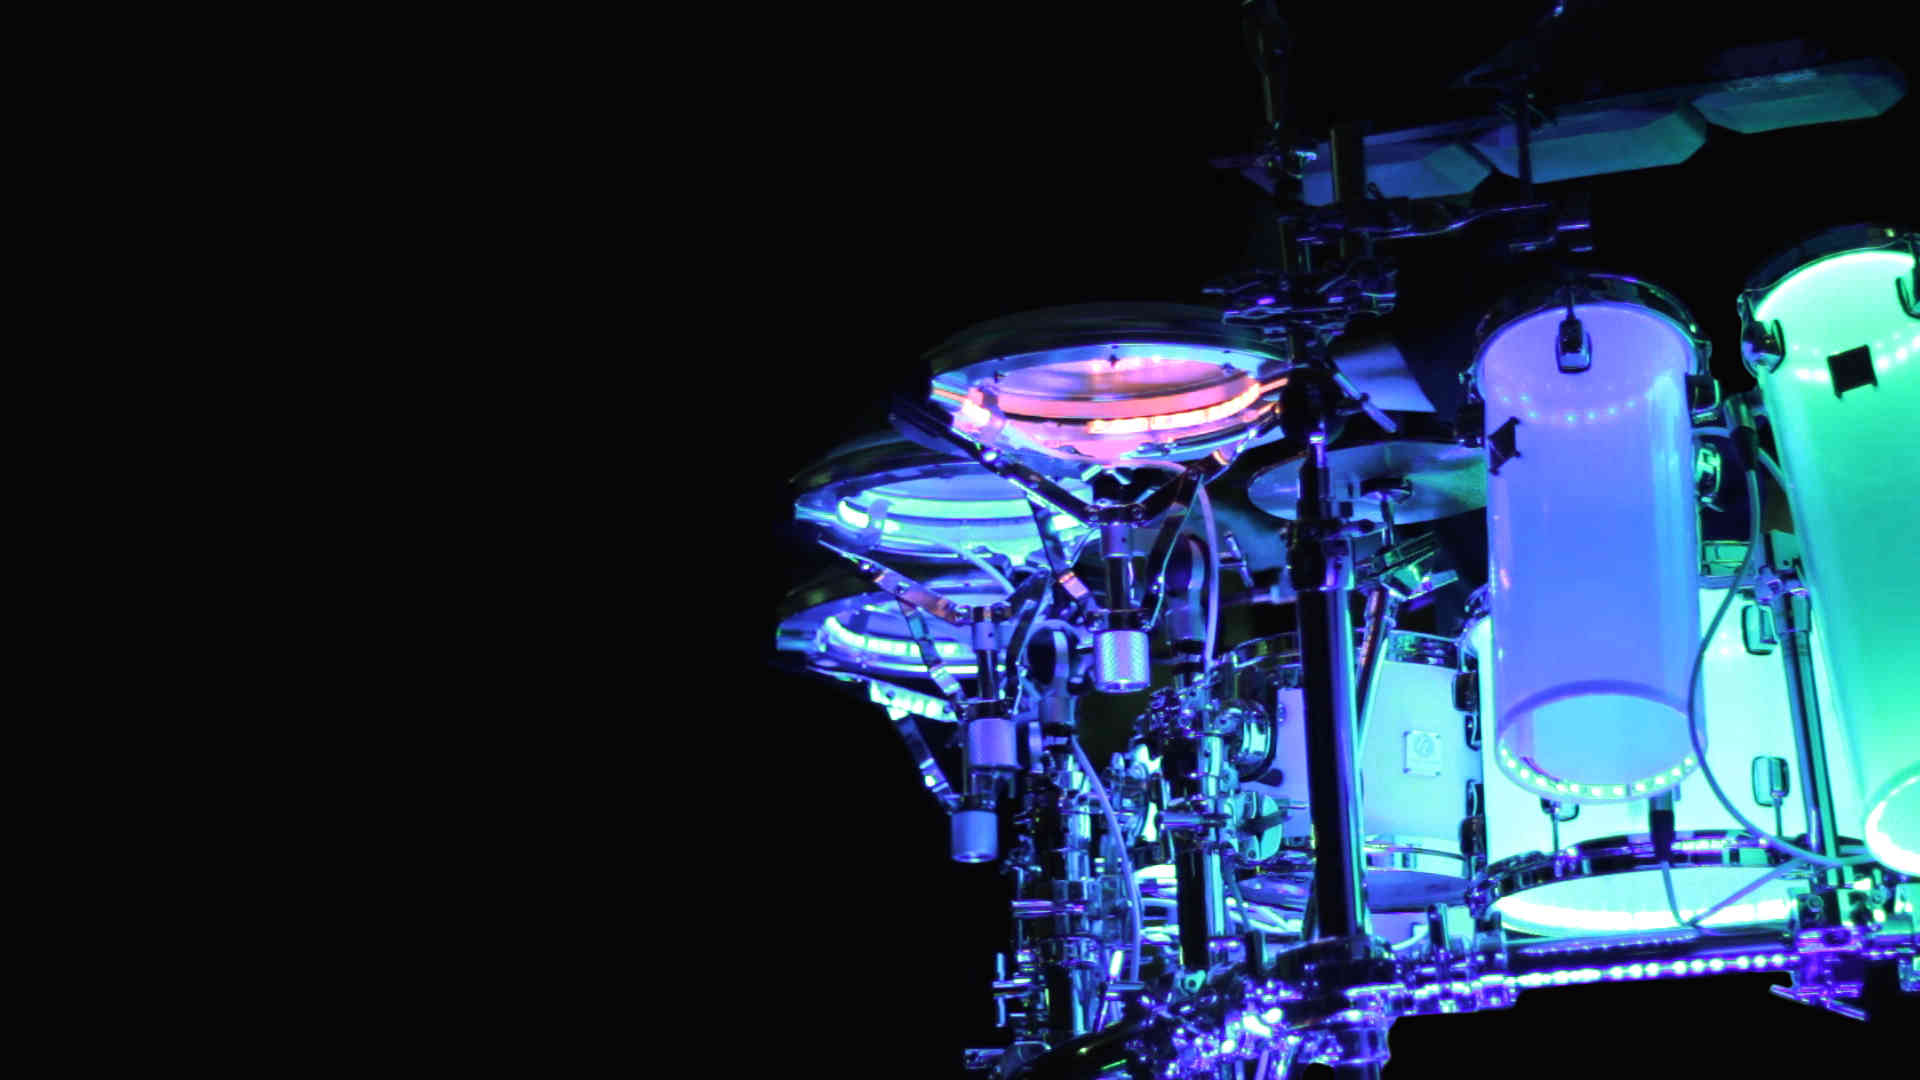 artist trommellichter tongebung music production. we create, form and shape music. www.tongebung.com www.facebook.com/tongebung www.soundcloud.com/tongebung